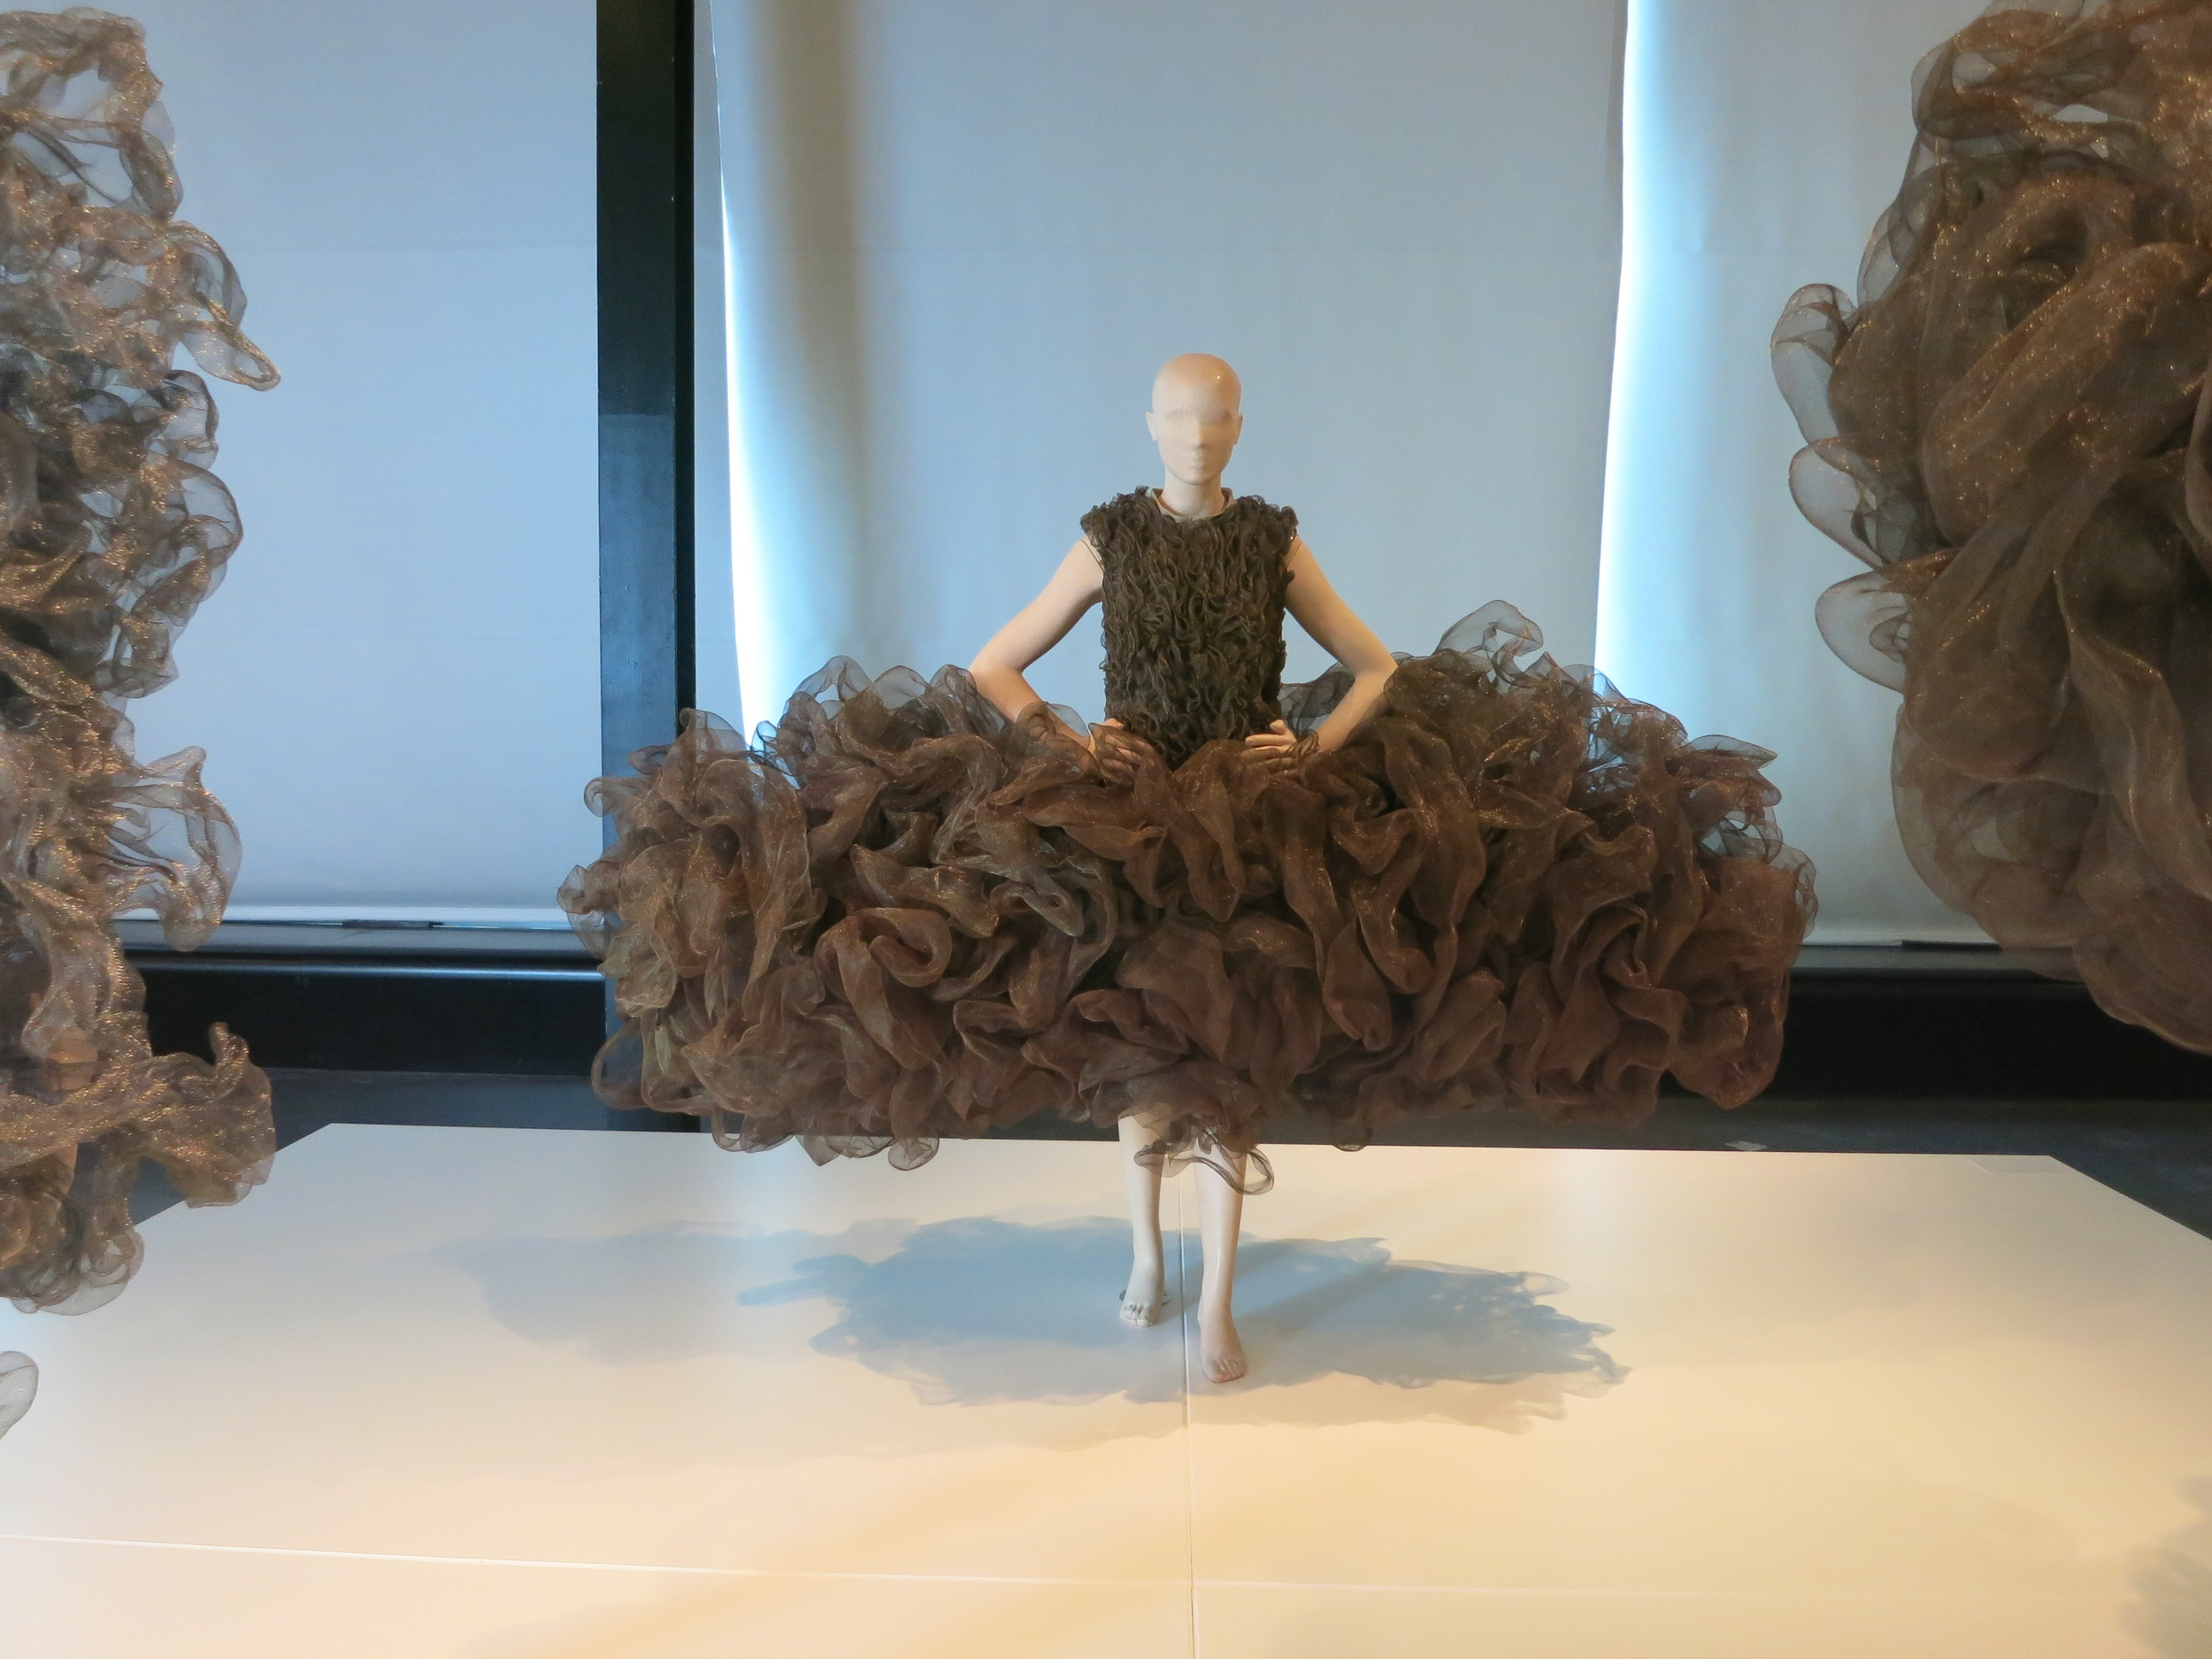 Iris van Herpen exhibition at the Calais Lace Museum 2013 - 'REFINERY SMOKE' 2008